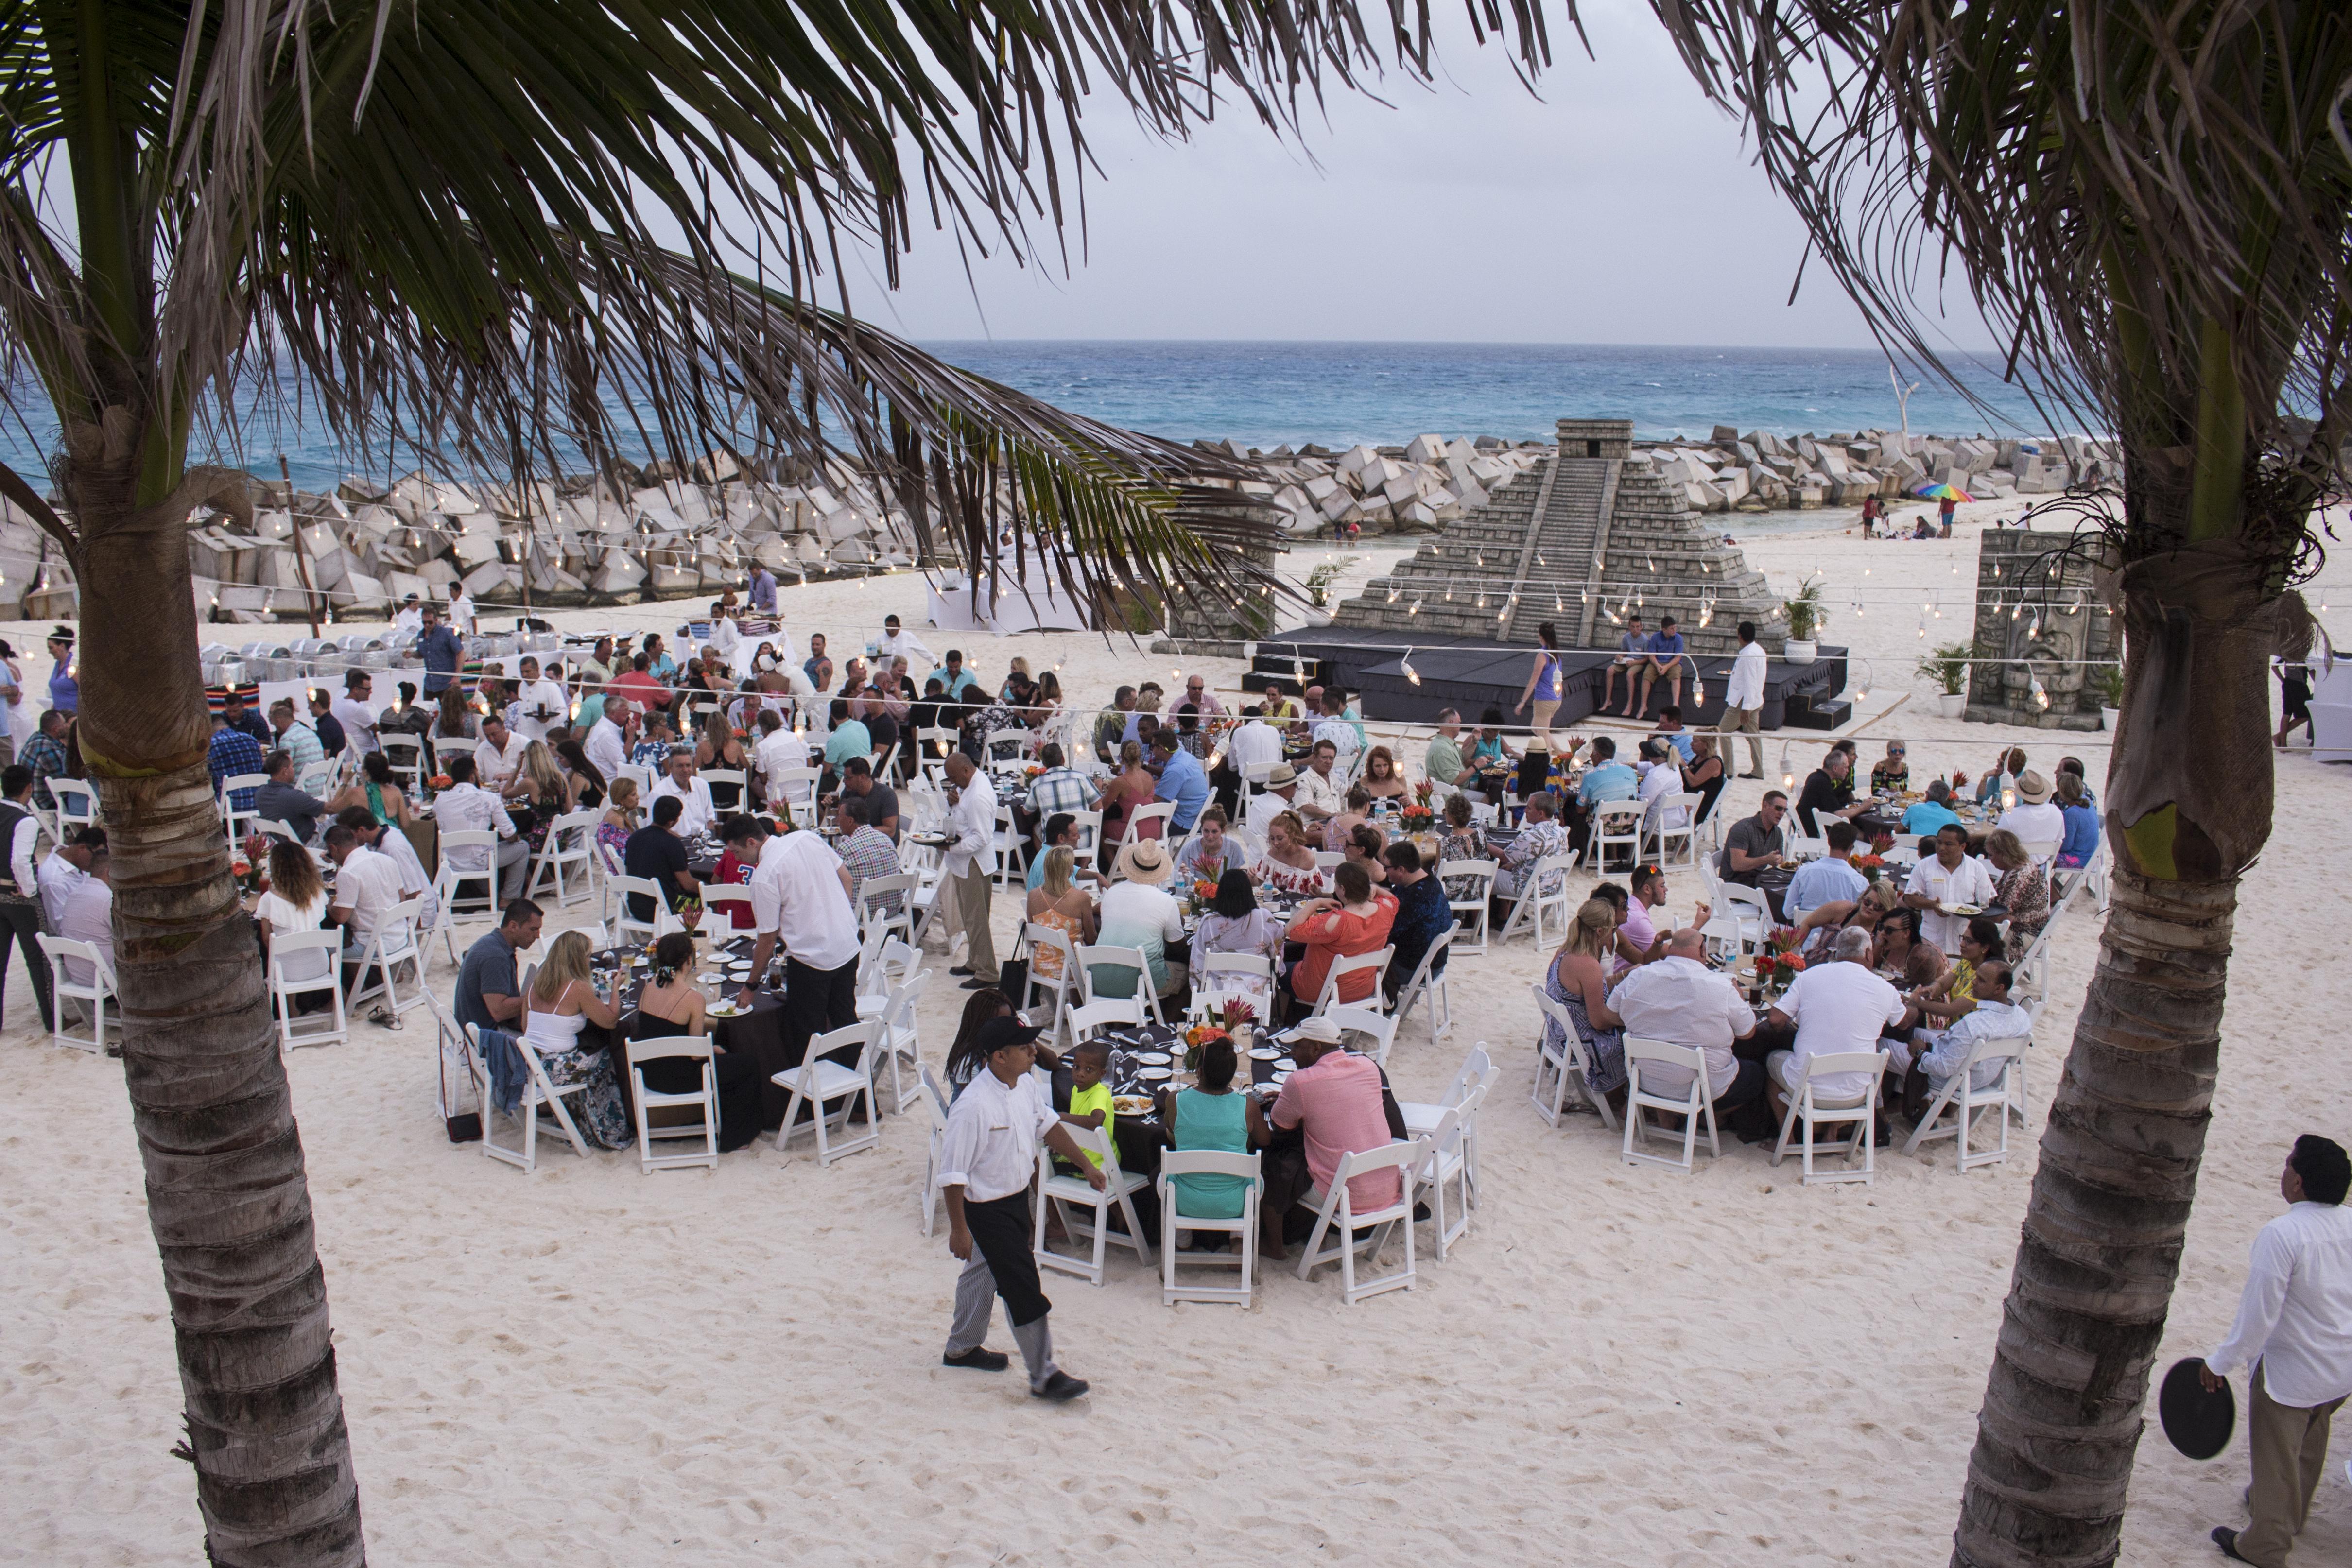 beach event between the palms